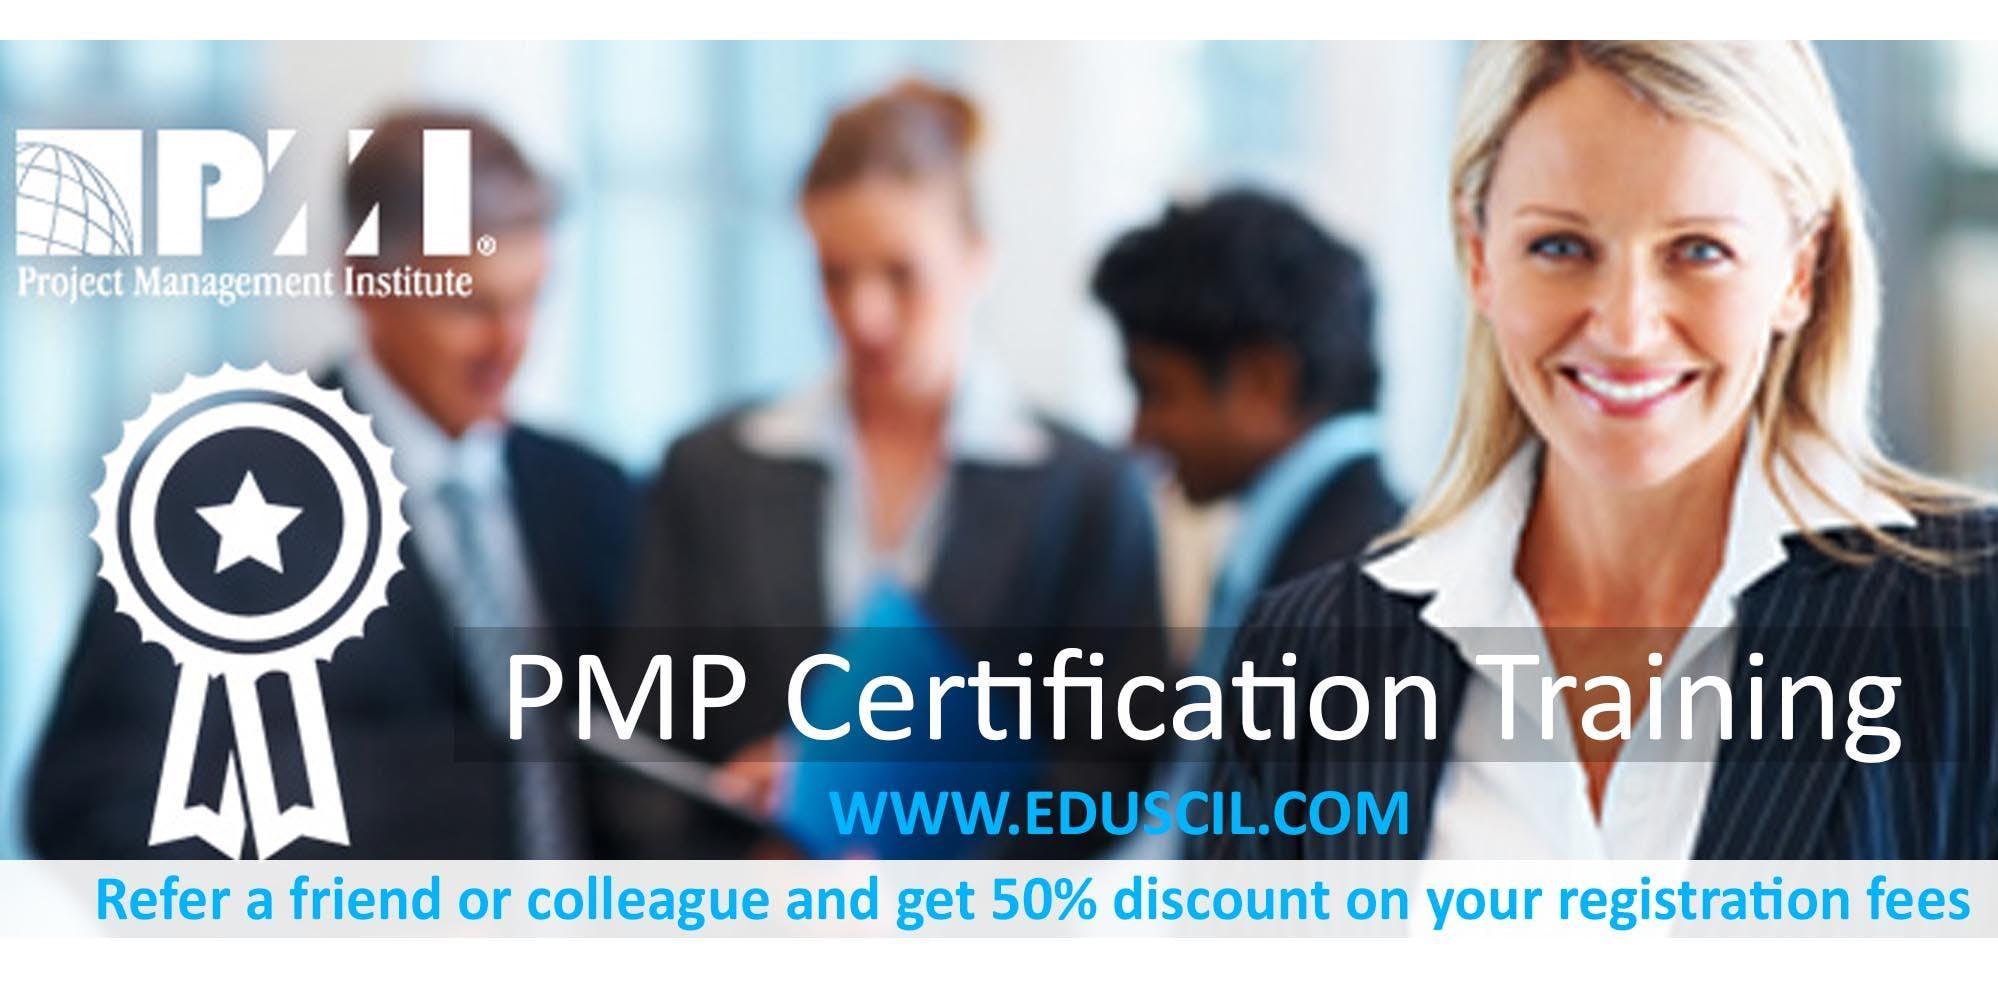 Pmp Classroom Training In Pittsburgh Pa Usa Eduscil 23 Jun 2018